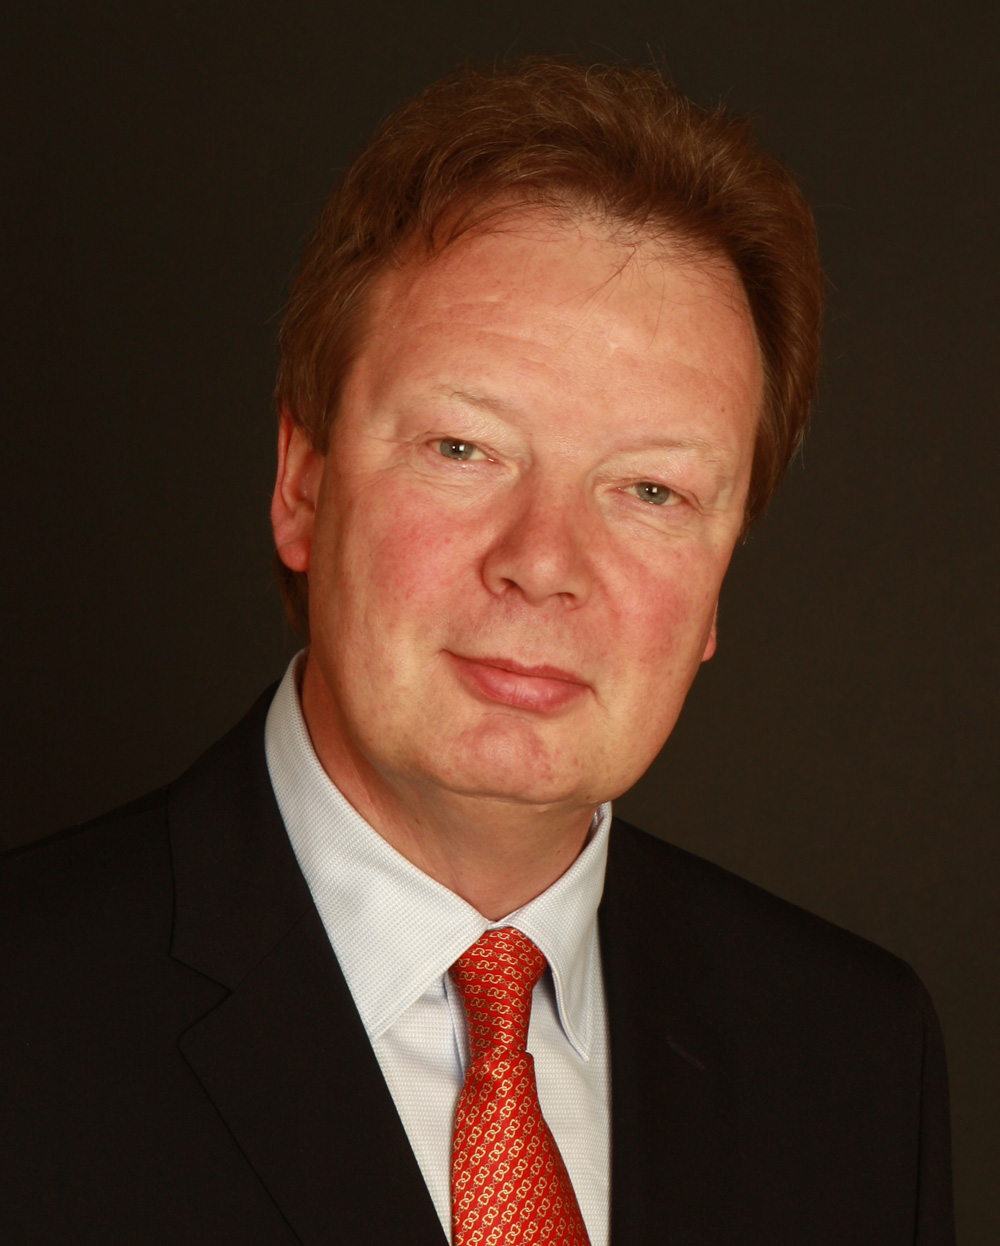 Peter Zemke